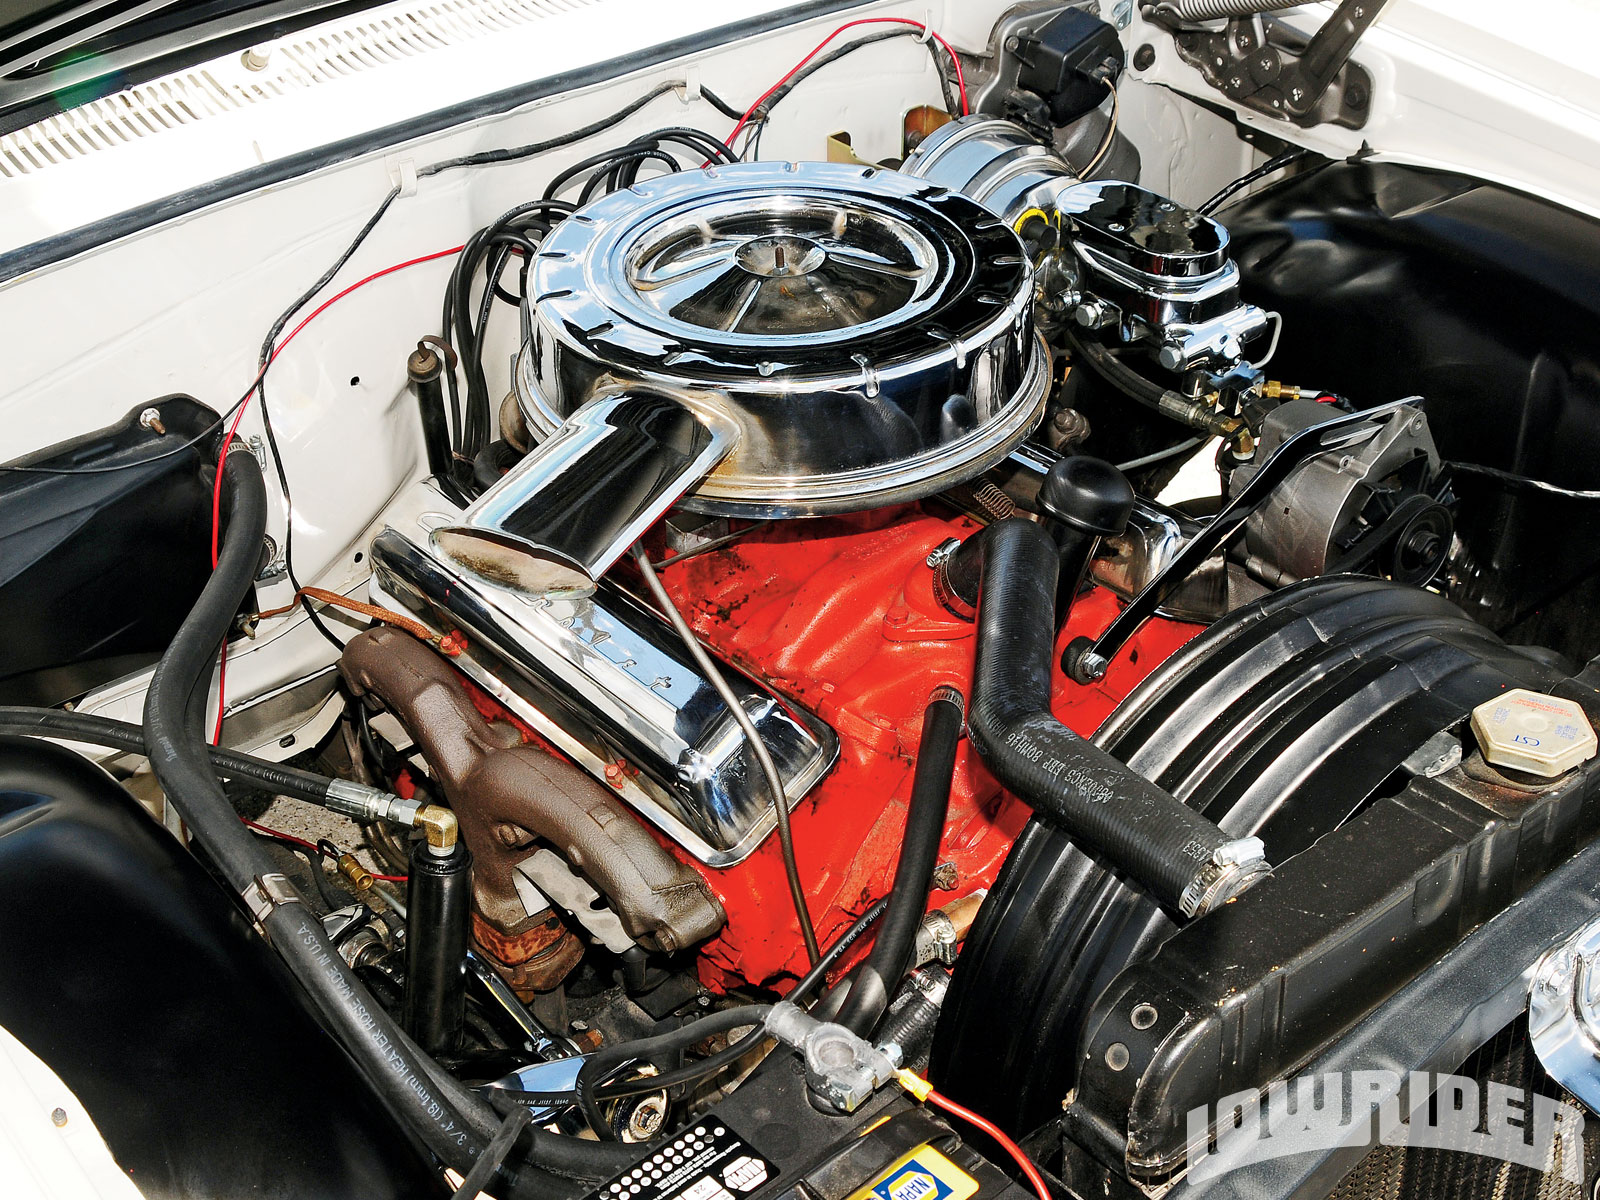 64 Impala Convertible >> 1964 Chevrolet Impala Convertible - Lowrider Magazine